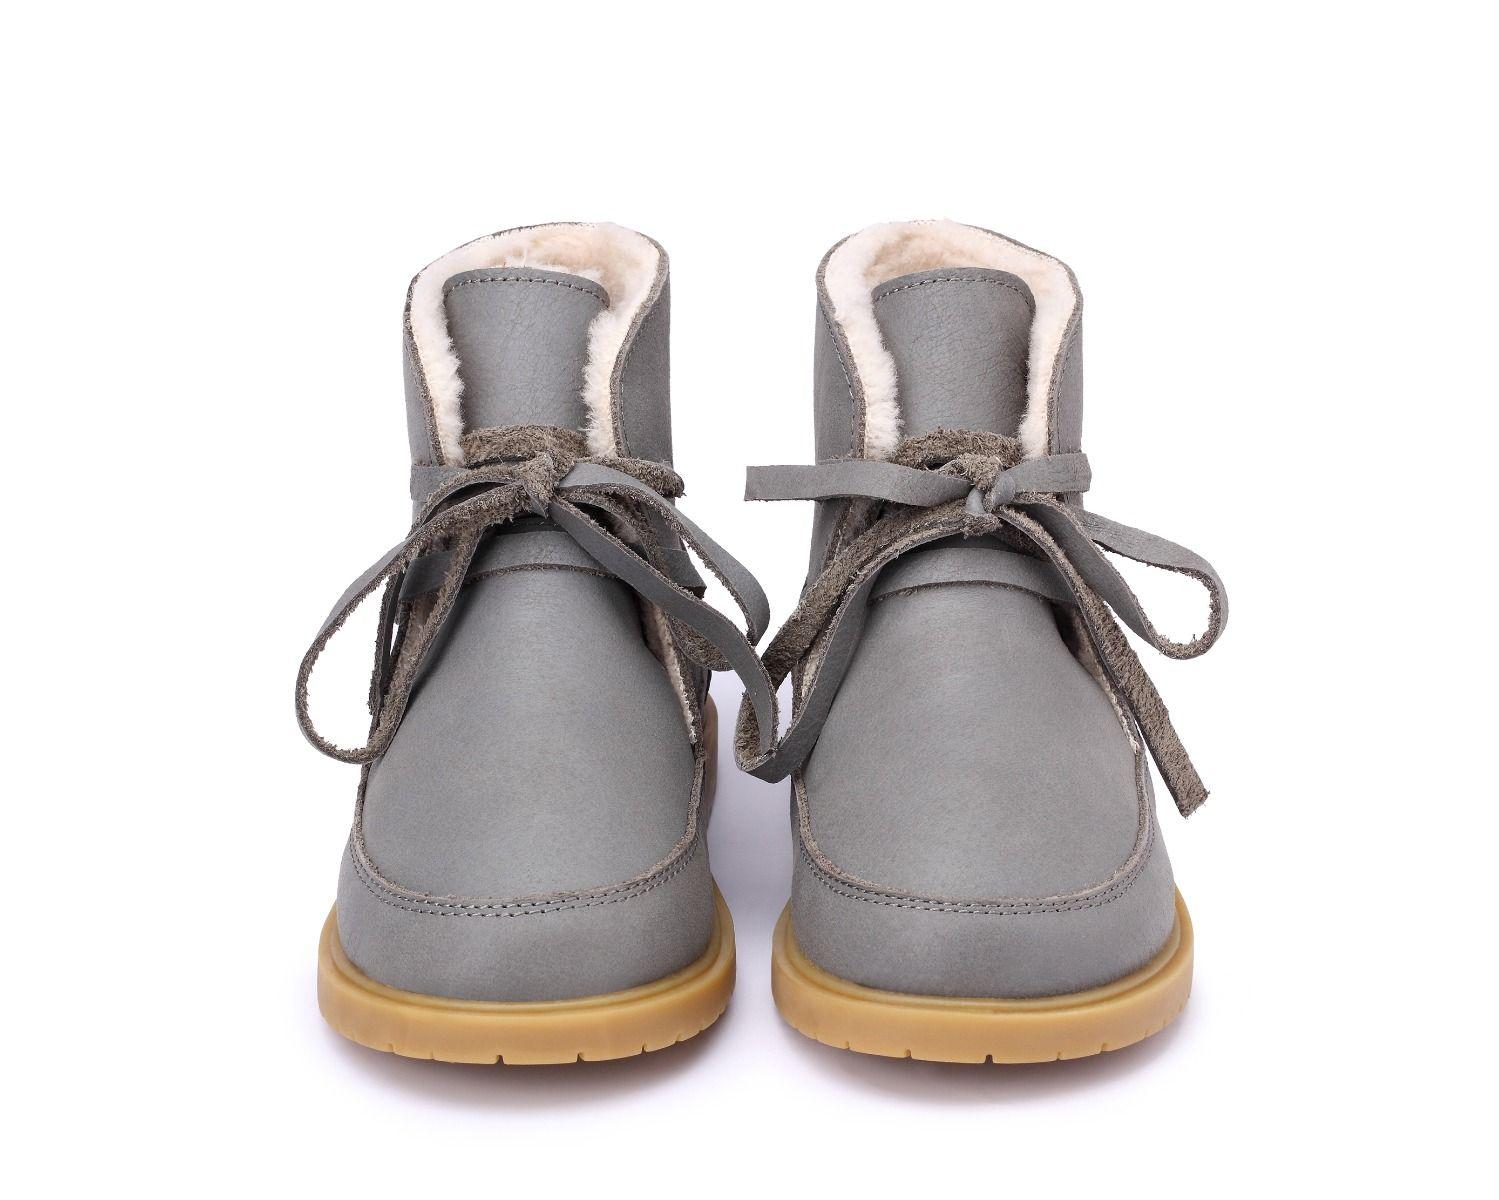 Buddy Lining | Mist Leather